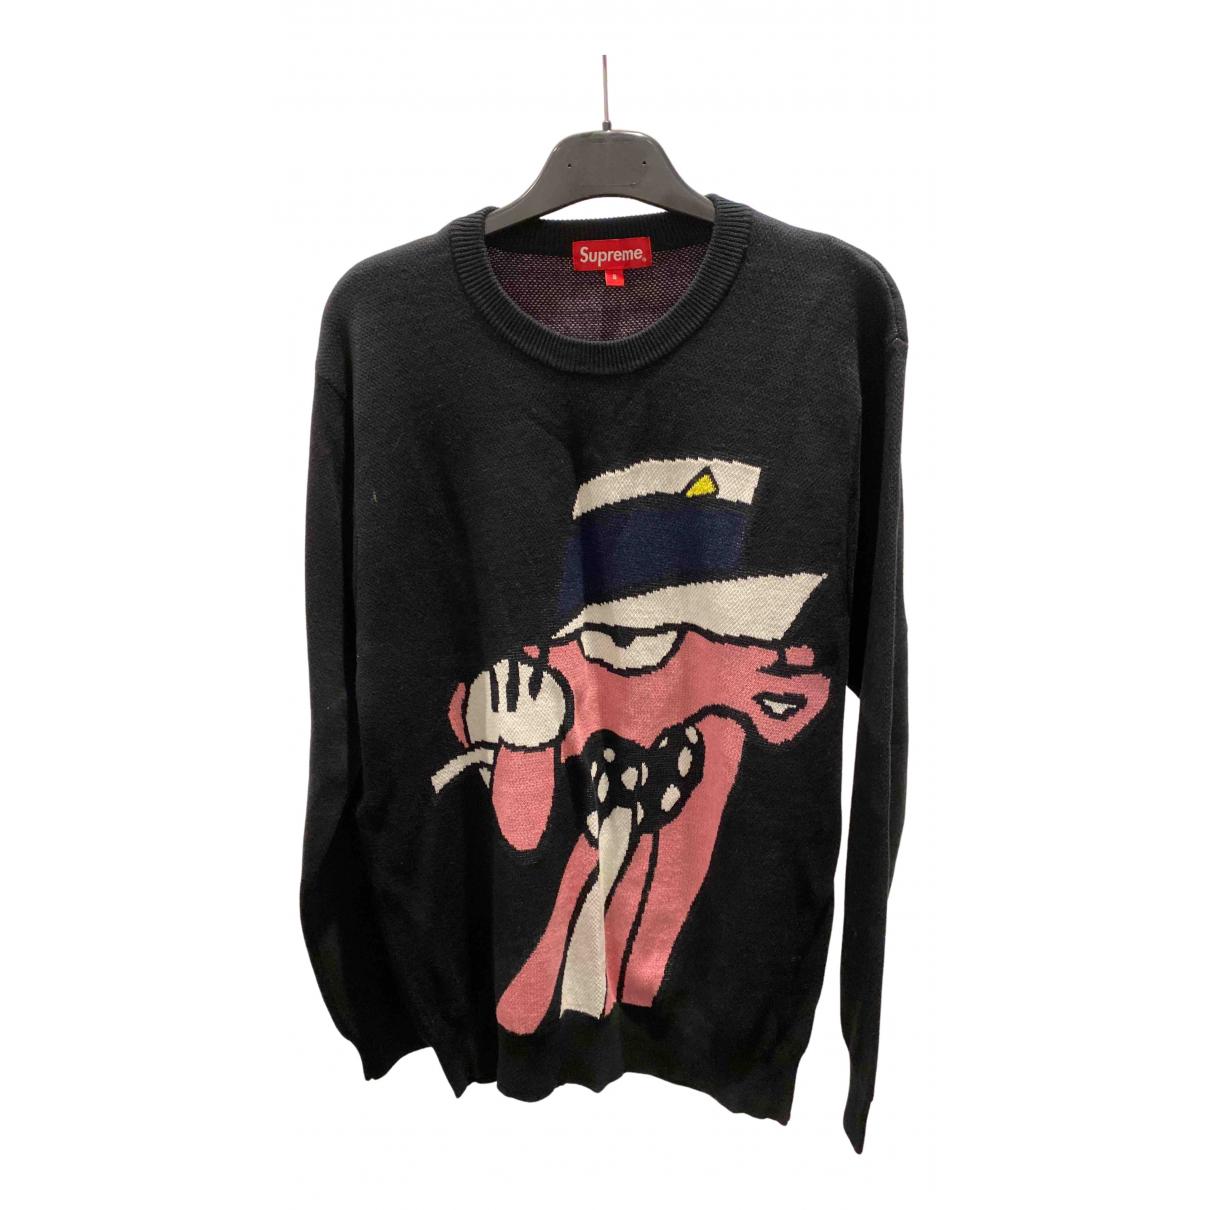 Supreme N Black Cotton Knitwear & Sweatshirts for Men S International